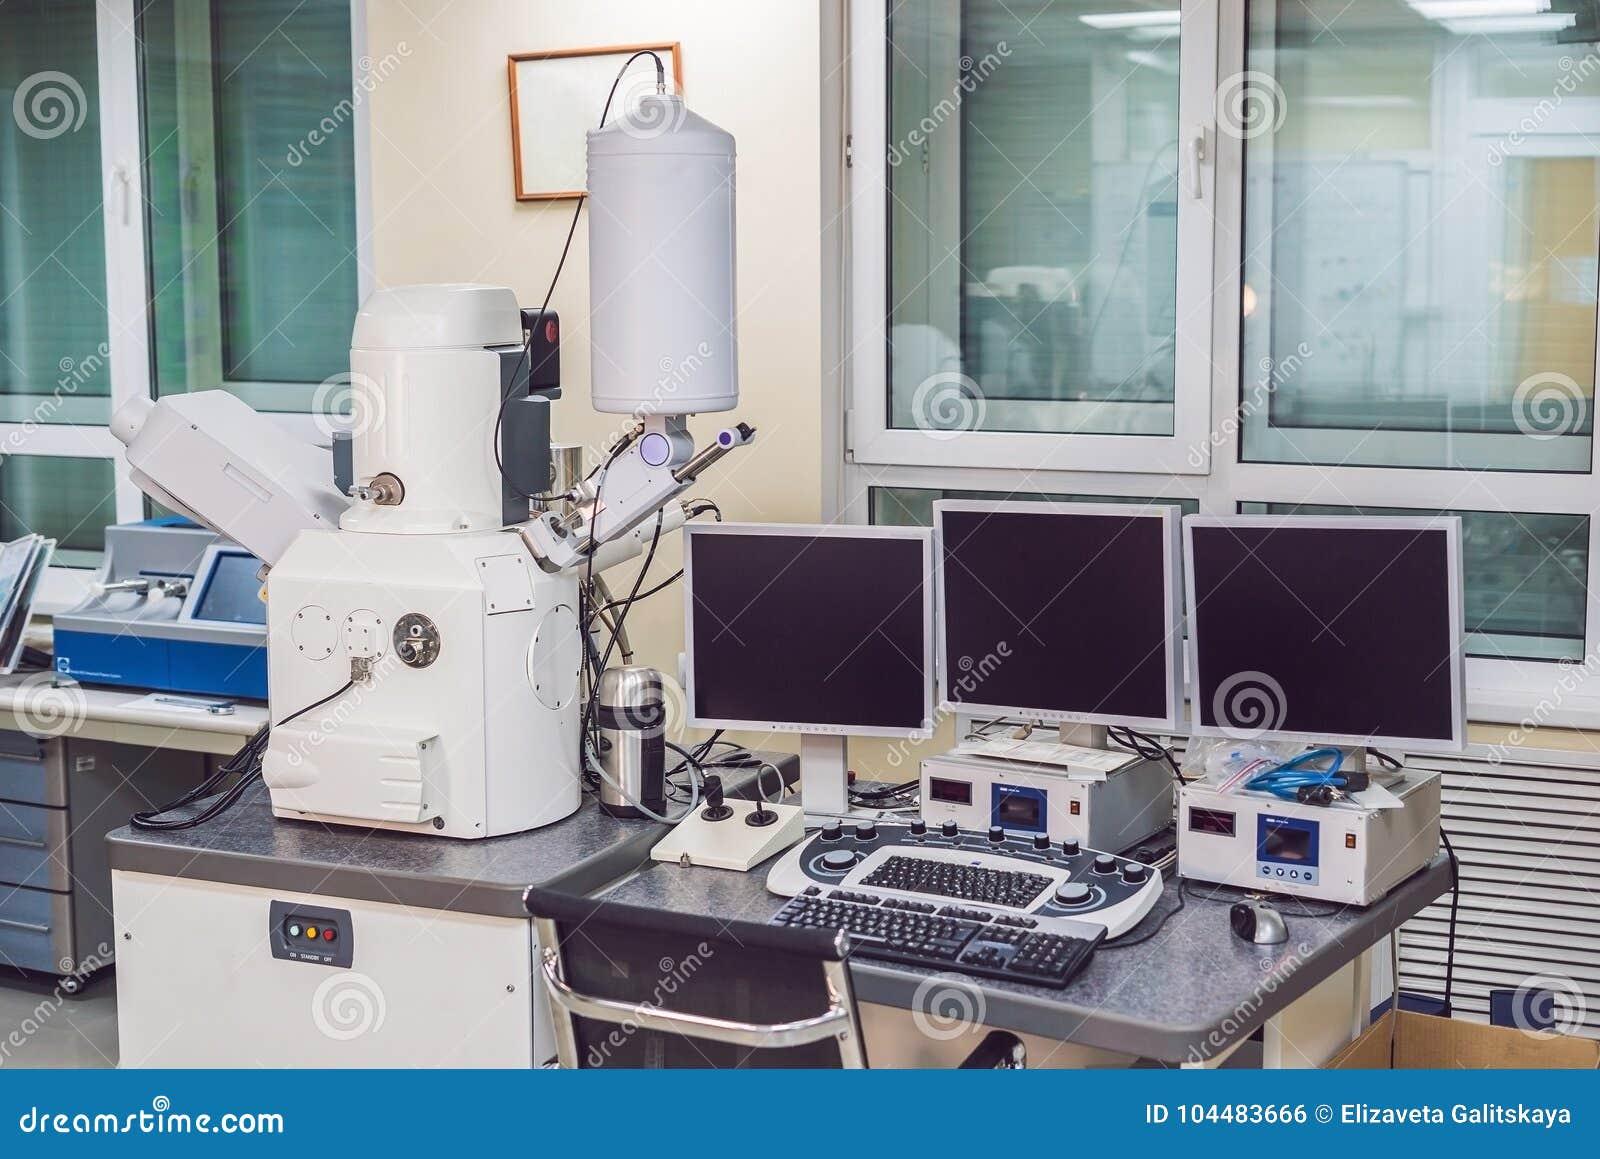 Microscope à balayage électronique de balayage